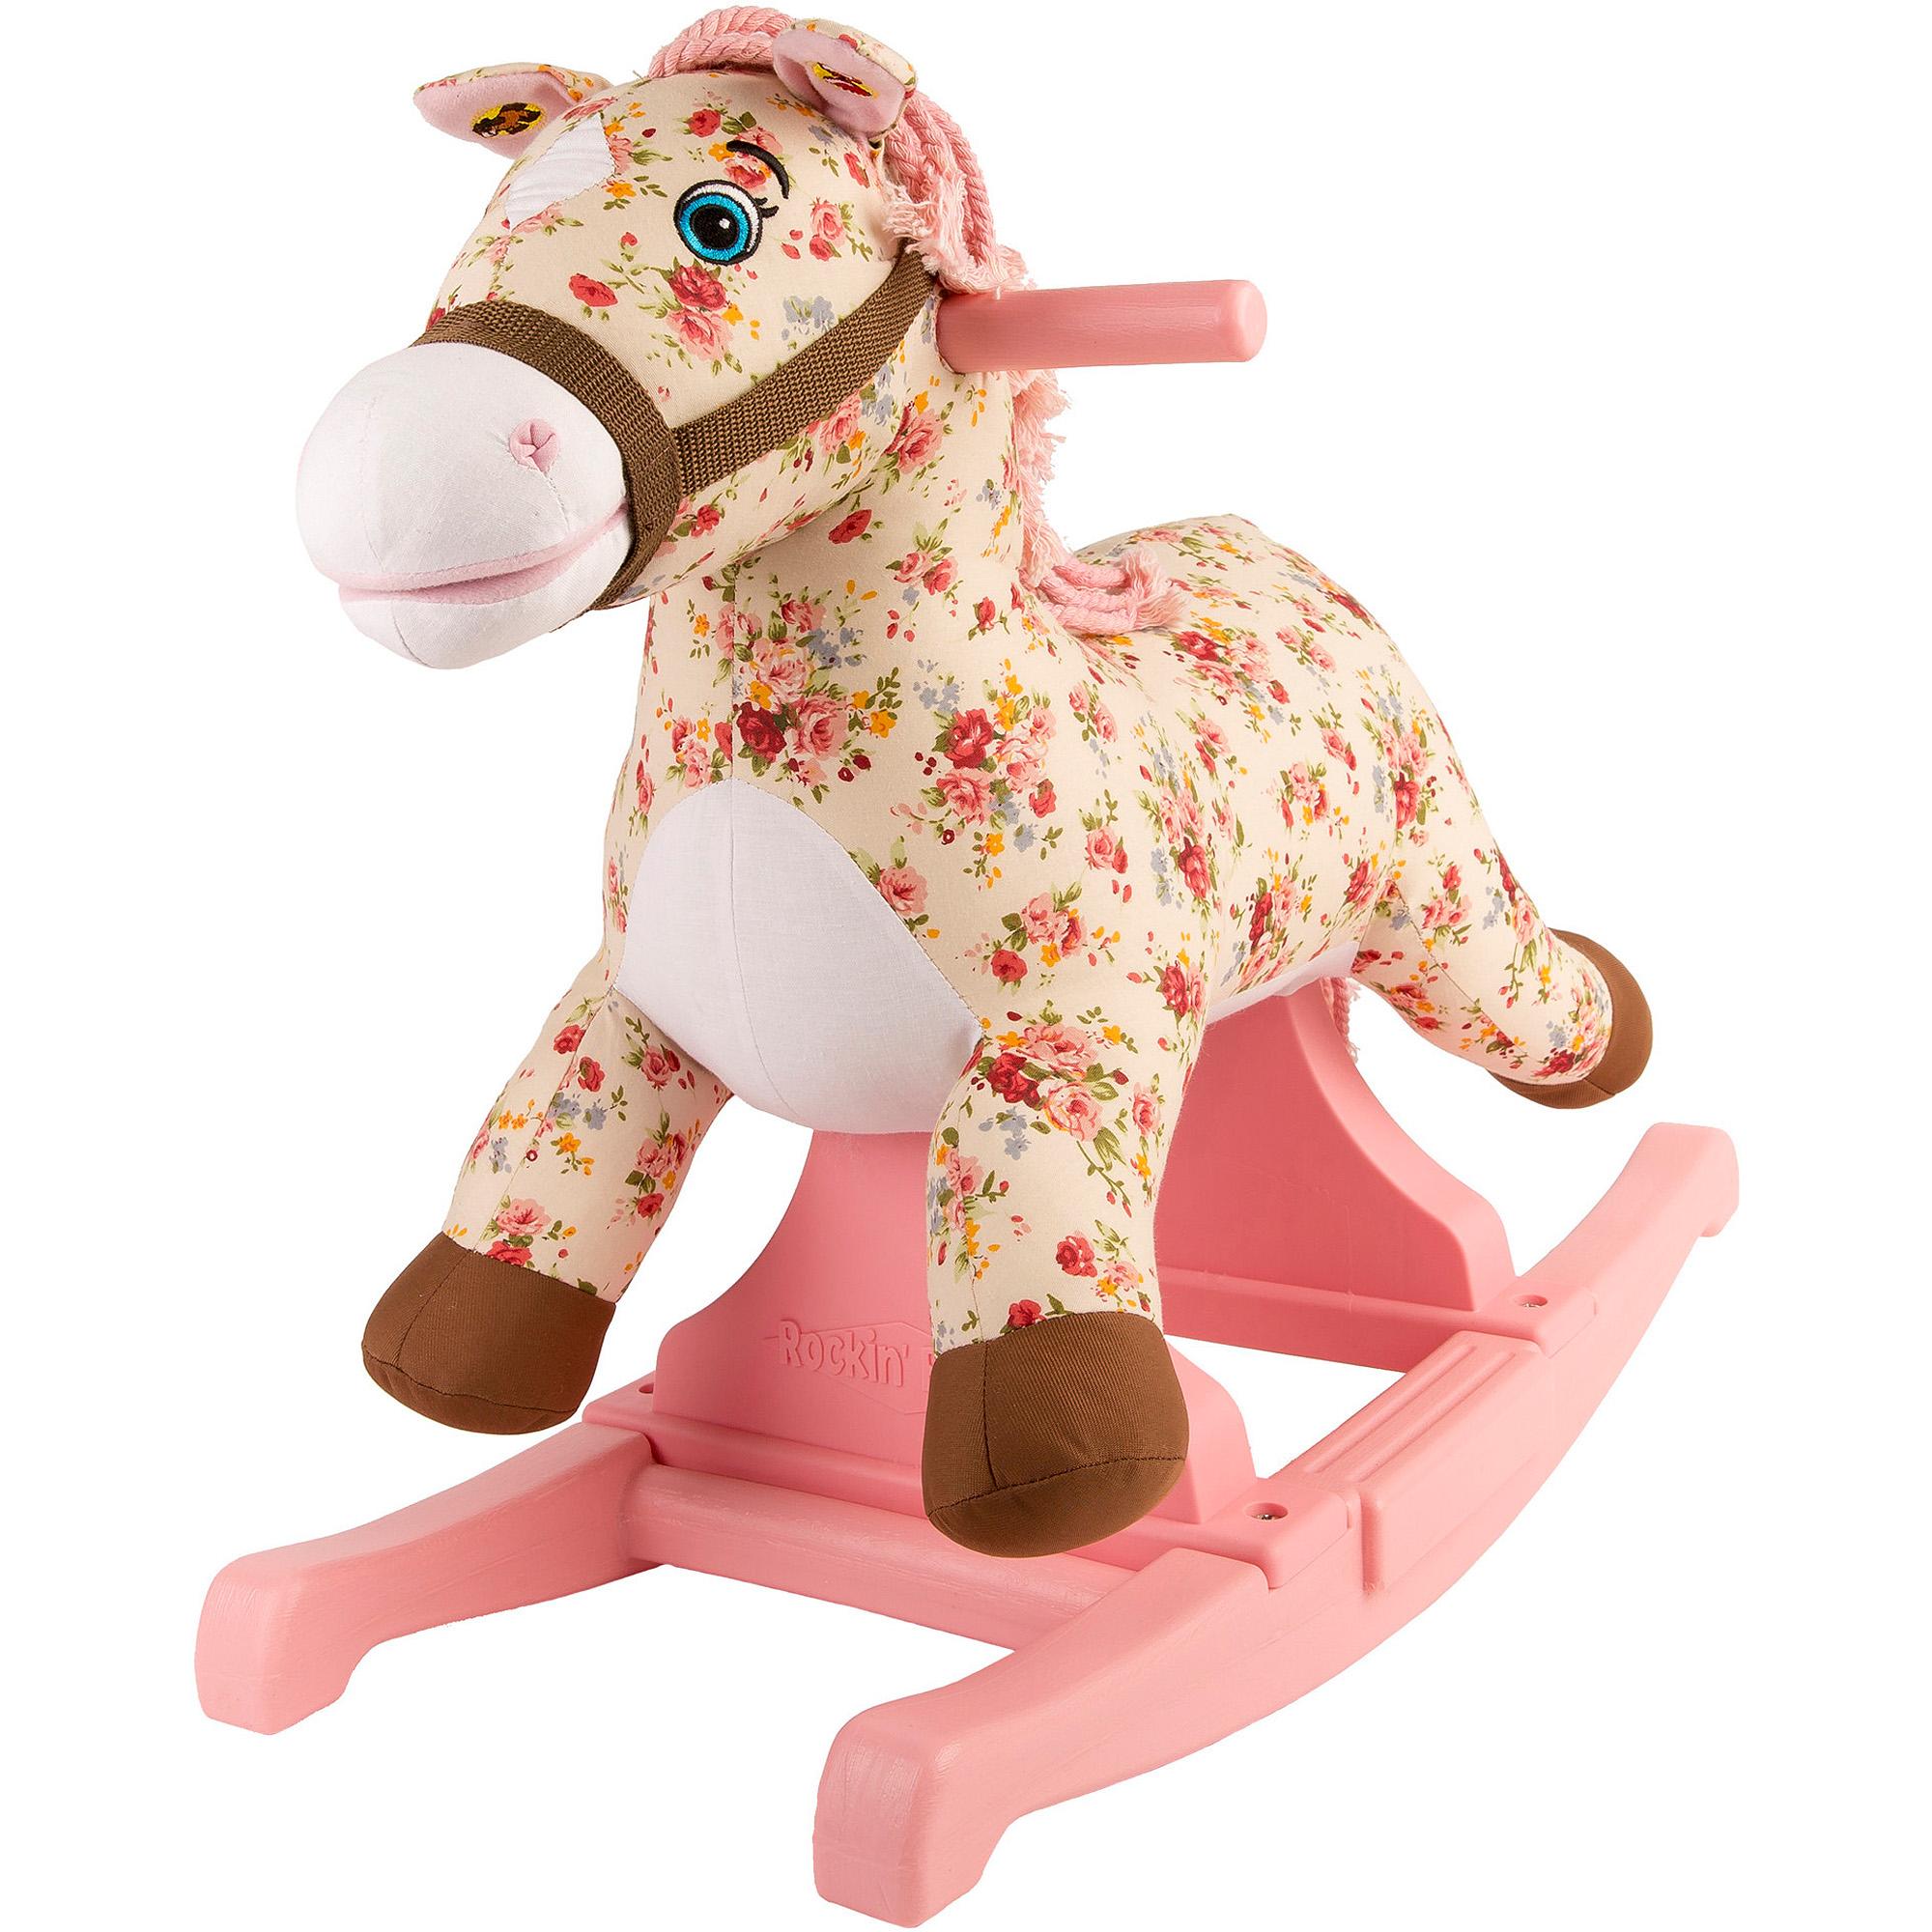 Rockin' Rider Flowers Vintage Rocking Pony